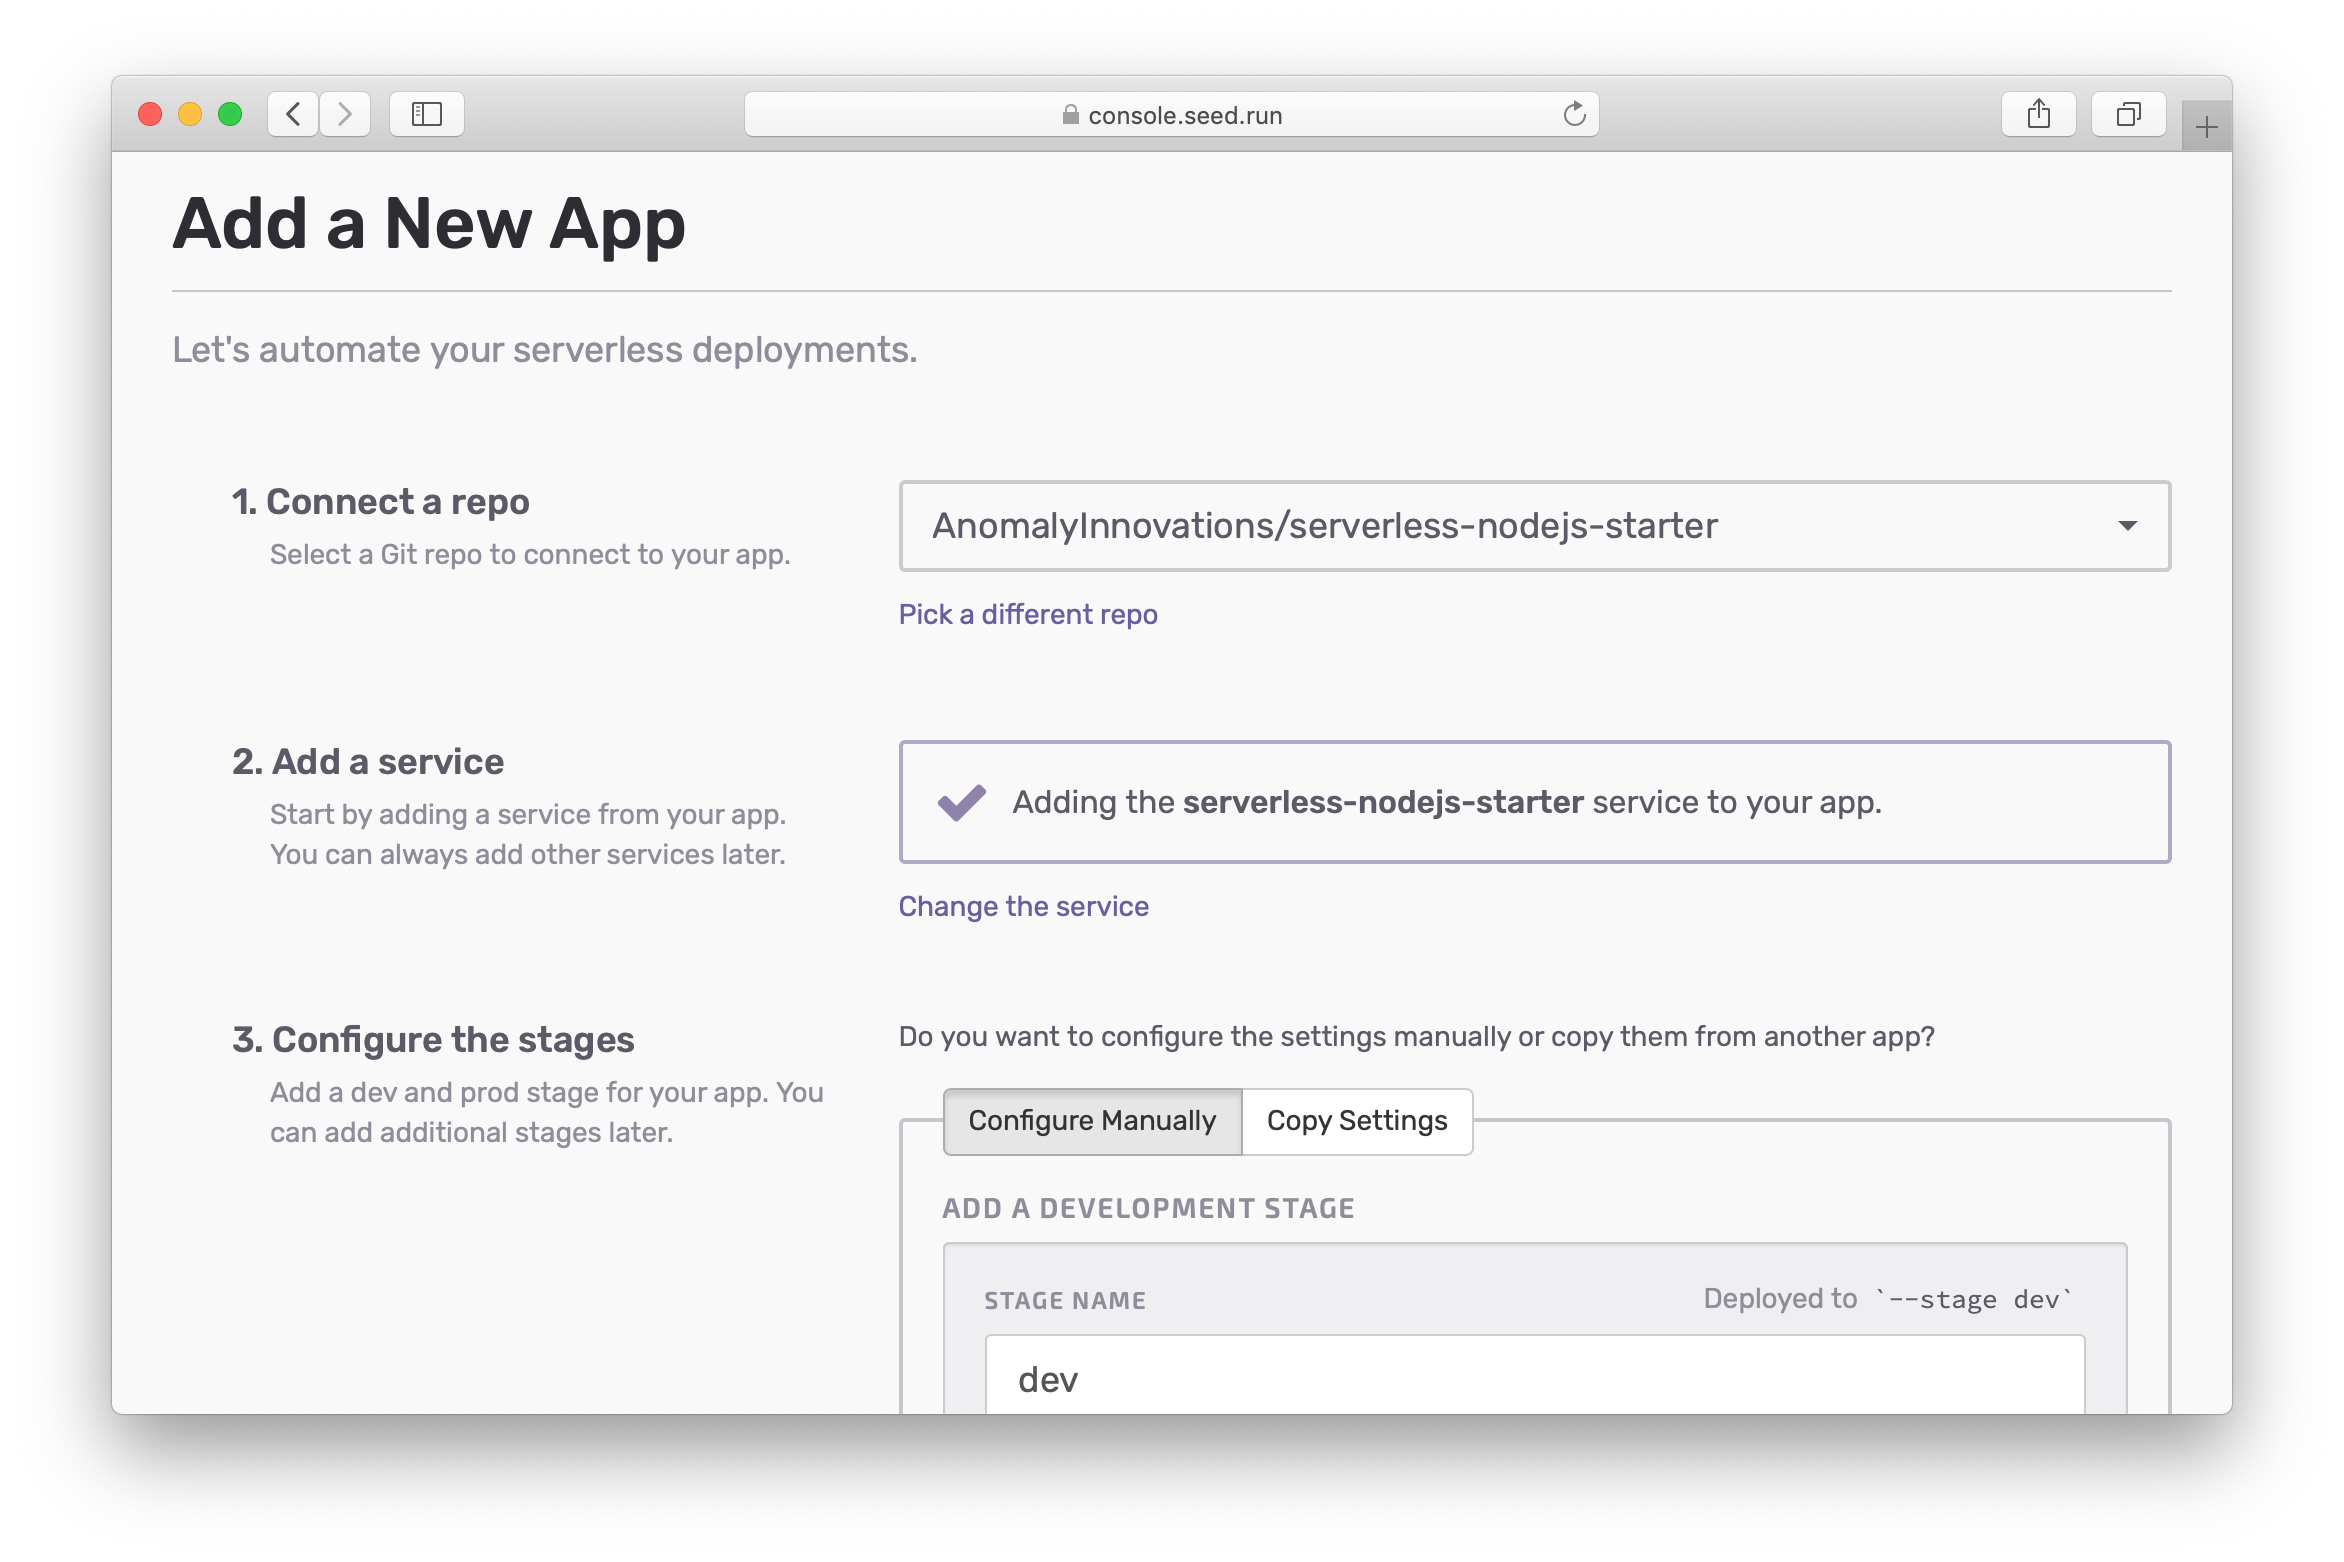 Confirm default service for new app